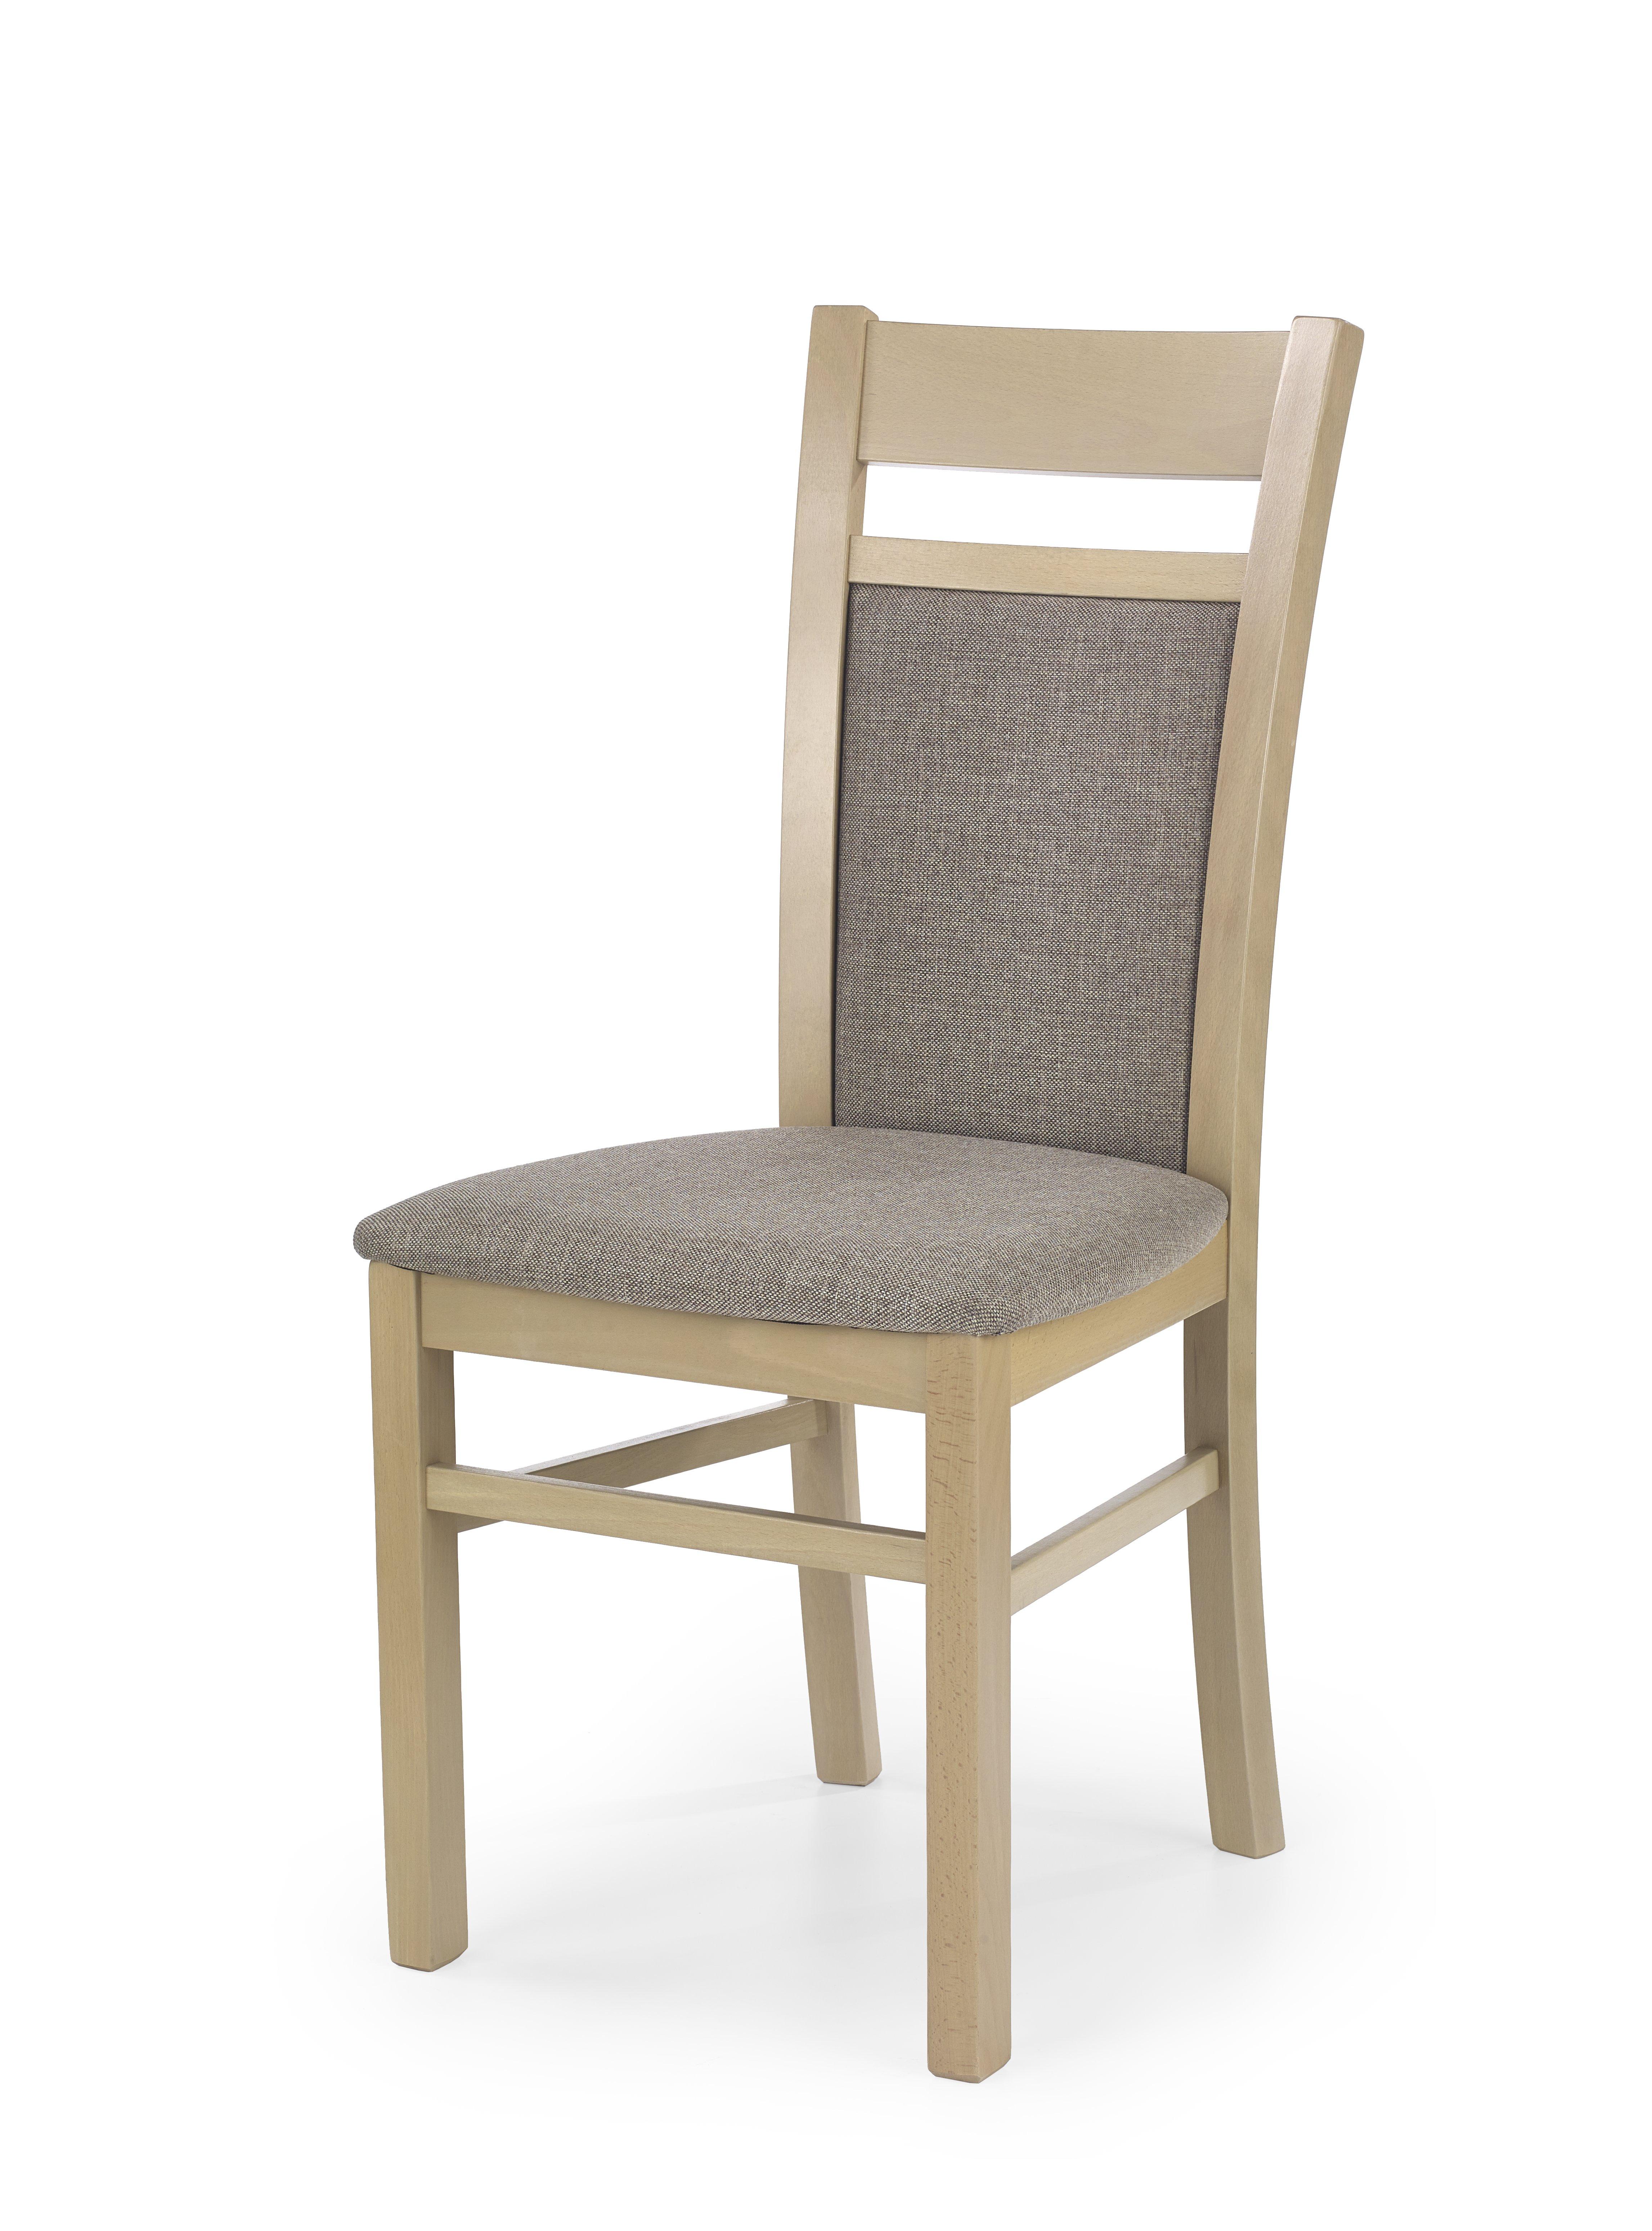 Jídelní židle - Halmar - Gerard 2 (dub sonoma + béžová)